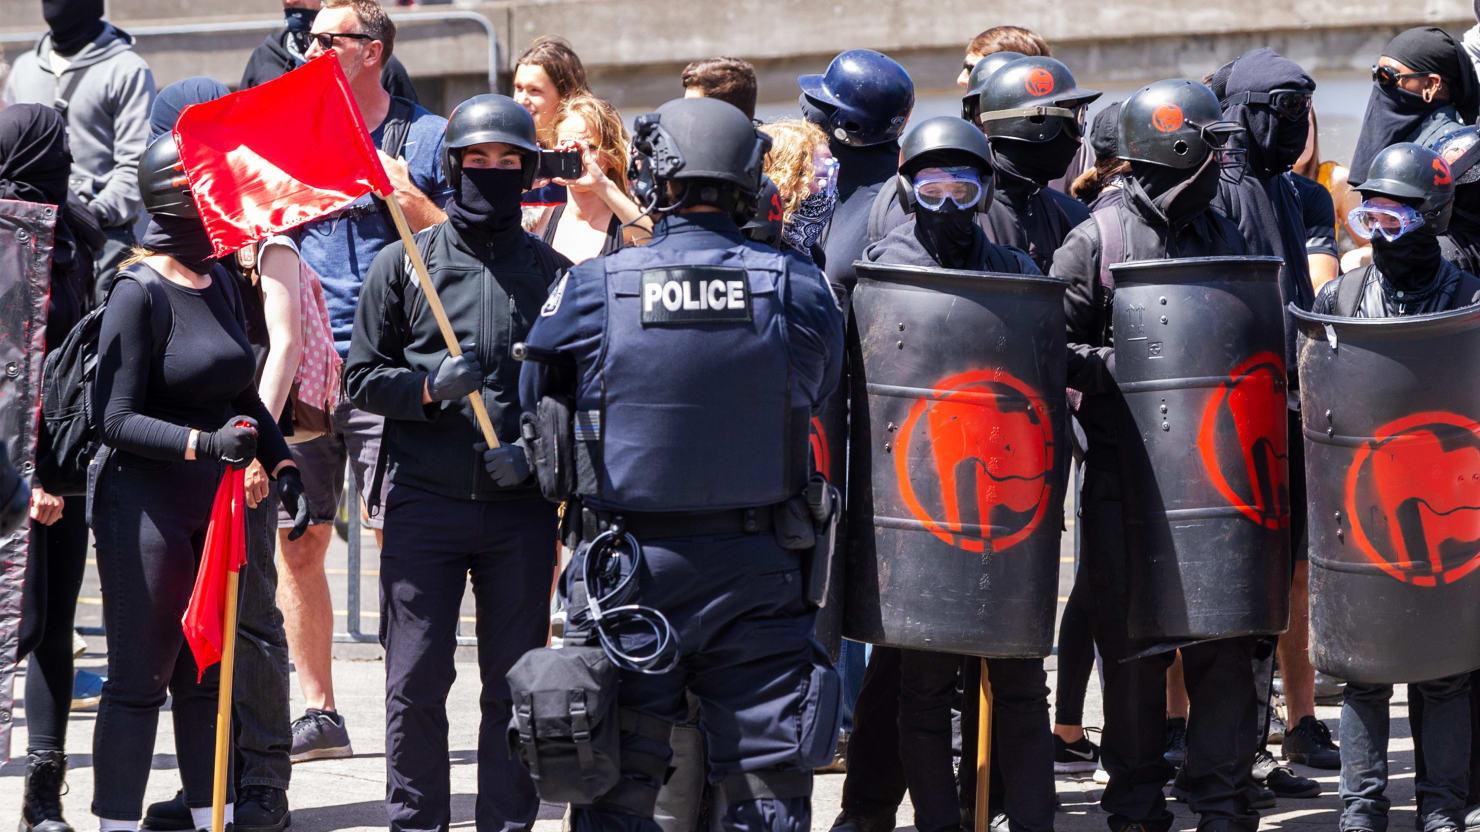 Antifa Portland Police Protect White Supremacy By